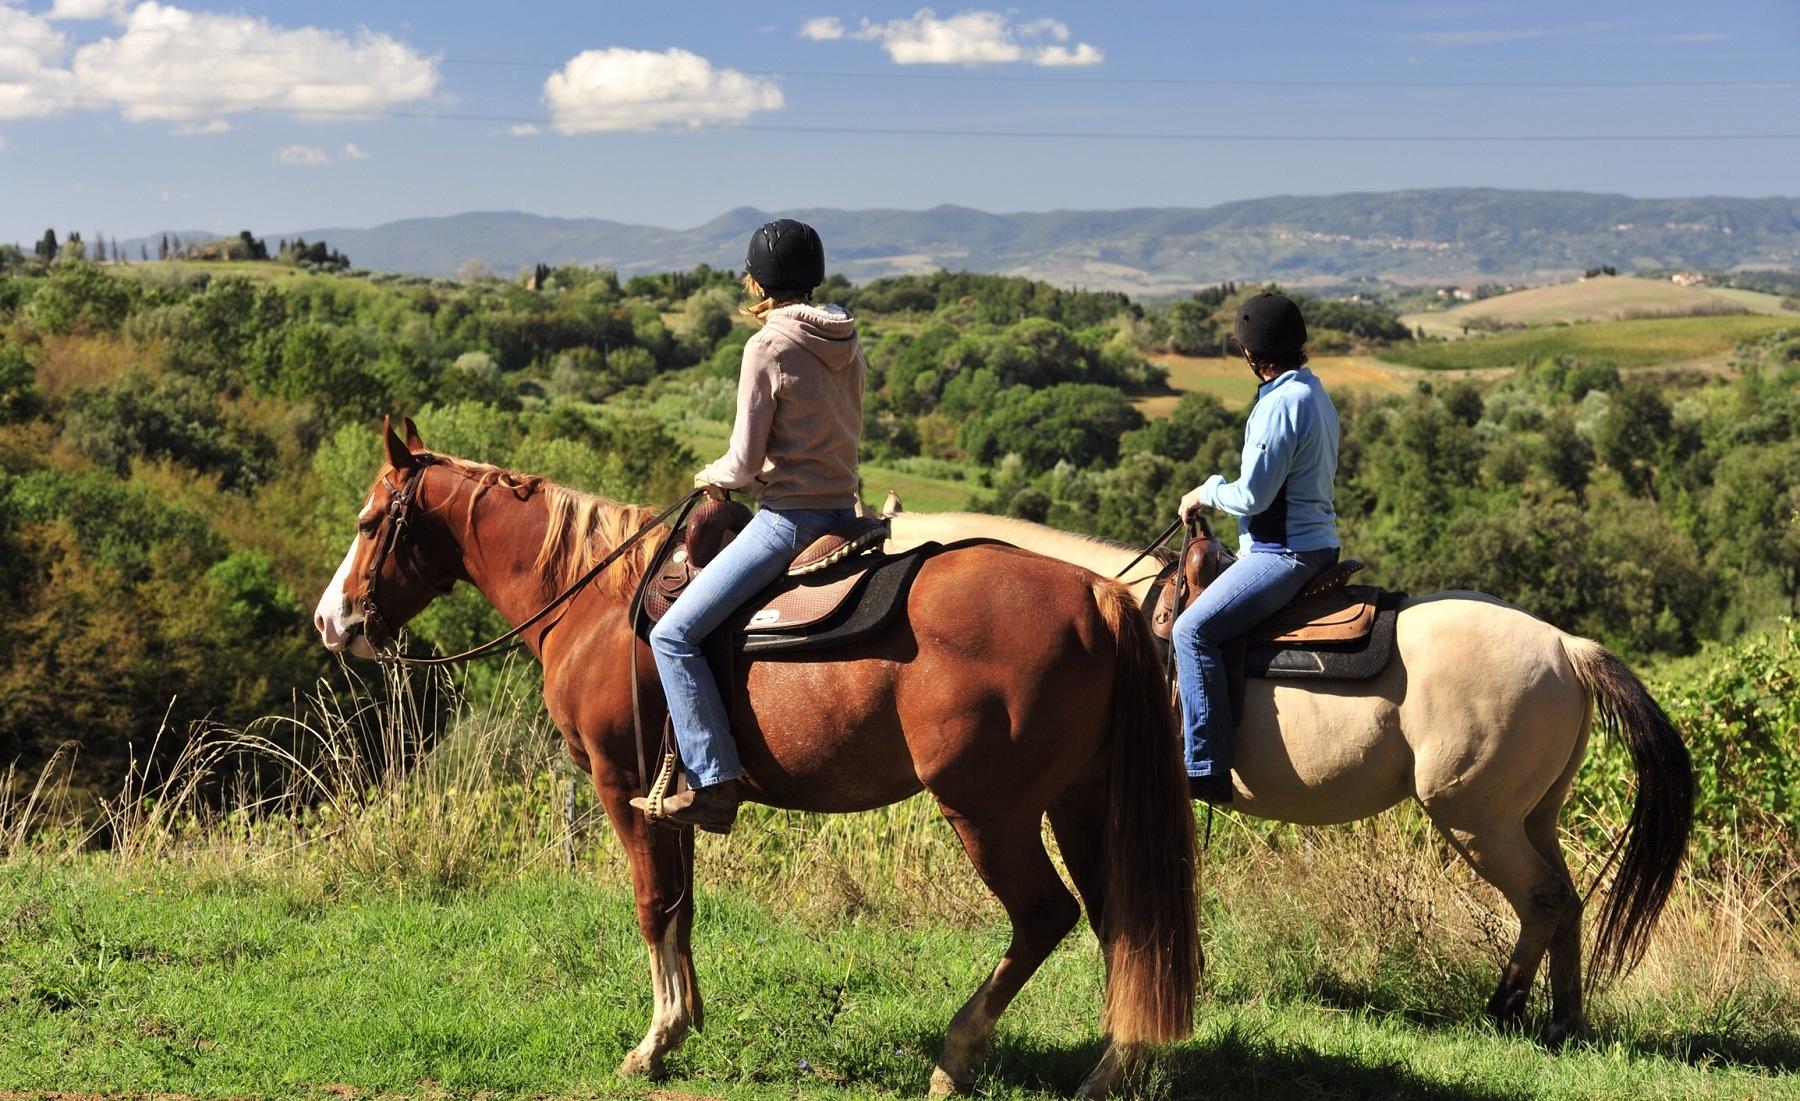 http://www.ilgiuncheto.it/wp-content/uploads/2016/02/equitazione.jpg